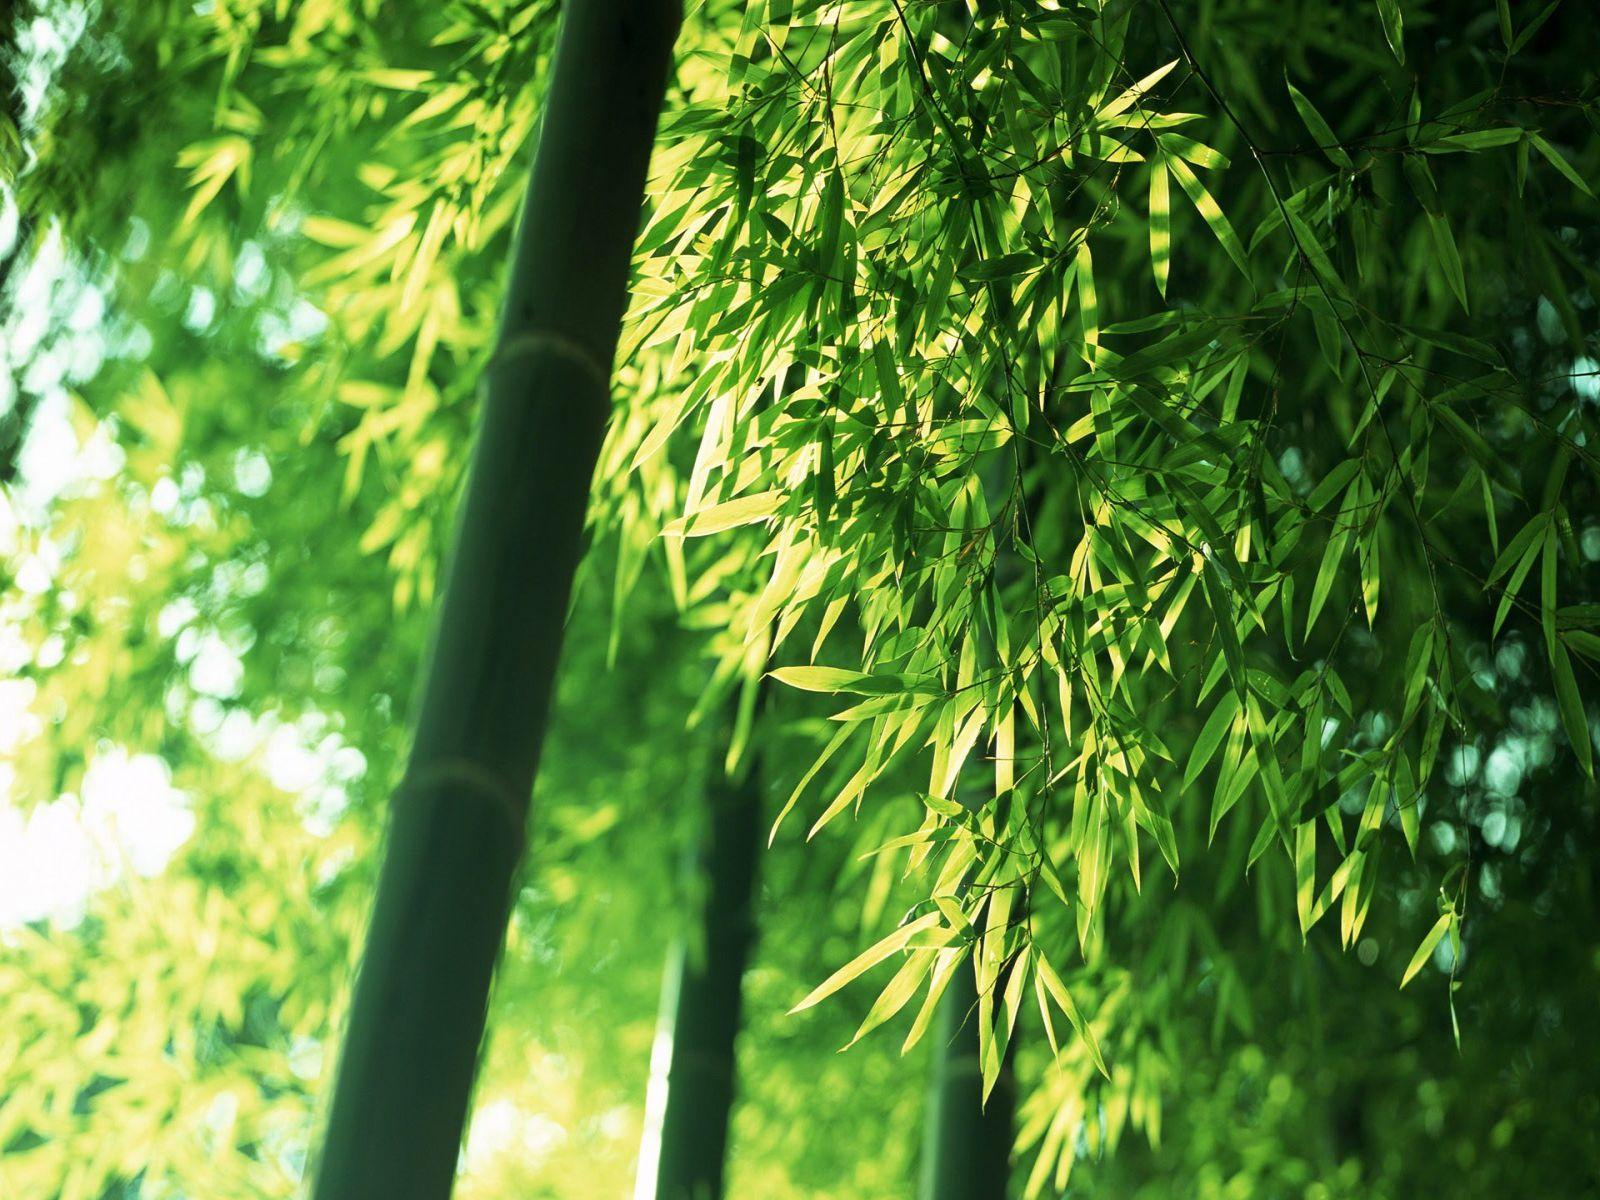 http://4.bp.blogspot.com/-LV5QKYawCQg/TqKZ7QZ5kaI/AAAAAAAABH4/Tpdp8Nd-WjI/s1600/bamboo_forest_wallpaper.jpg